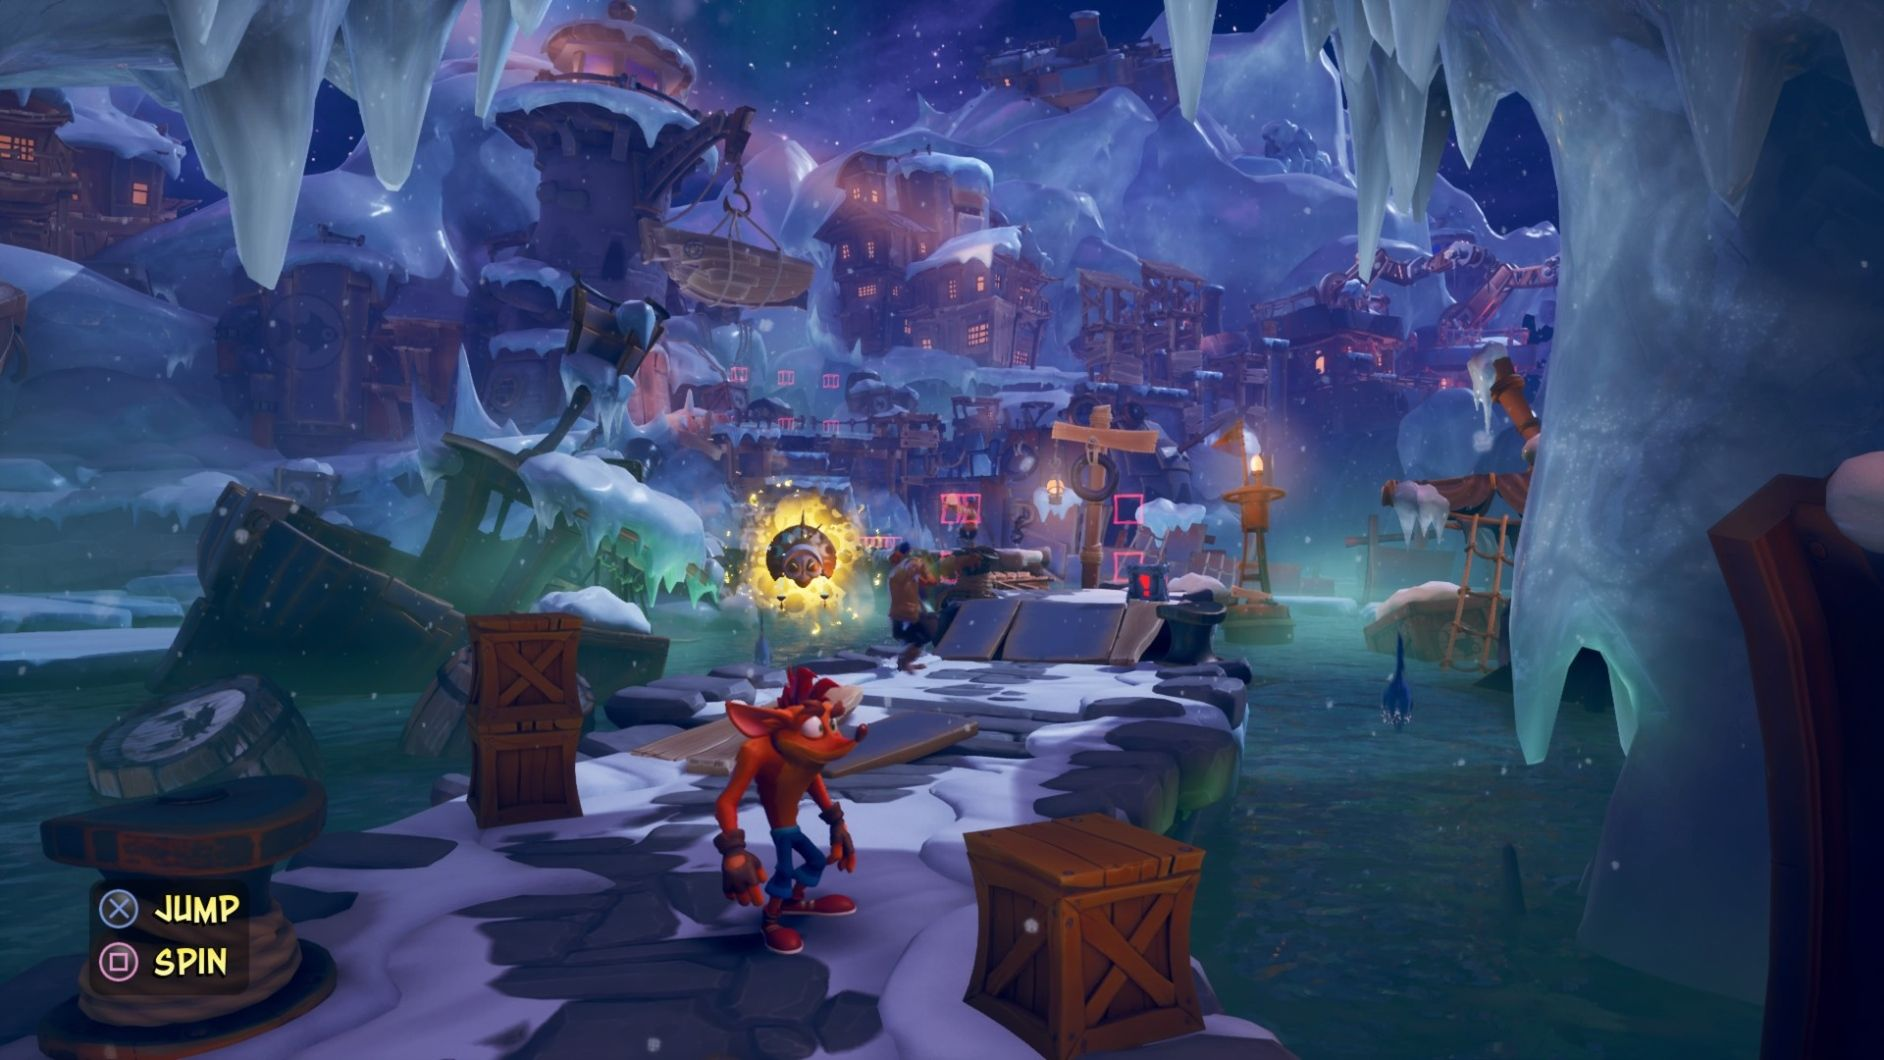 Preview: Crash Bandicoot 4 looks promising